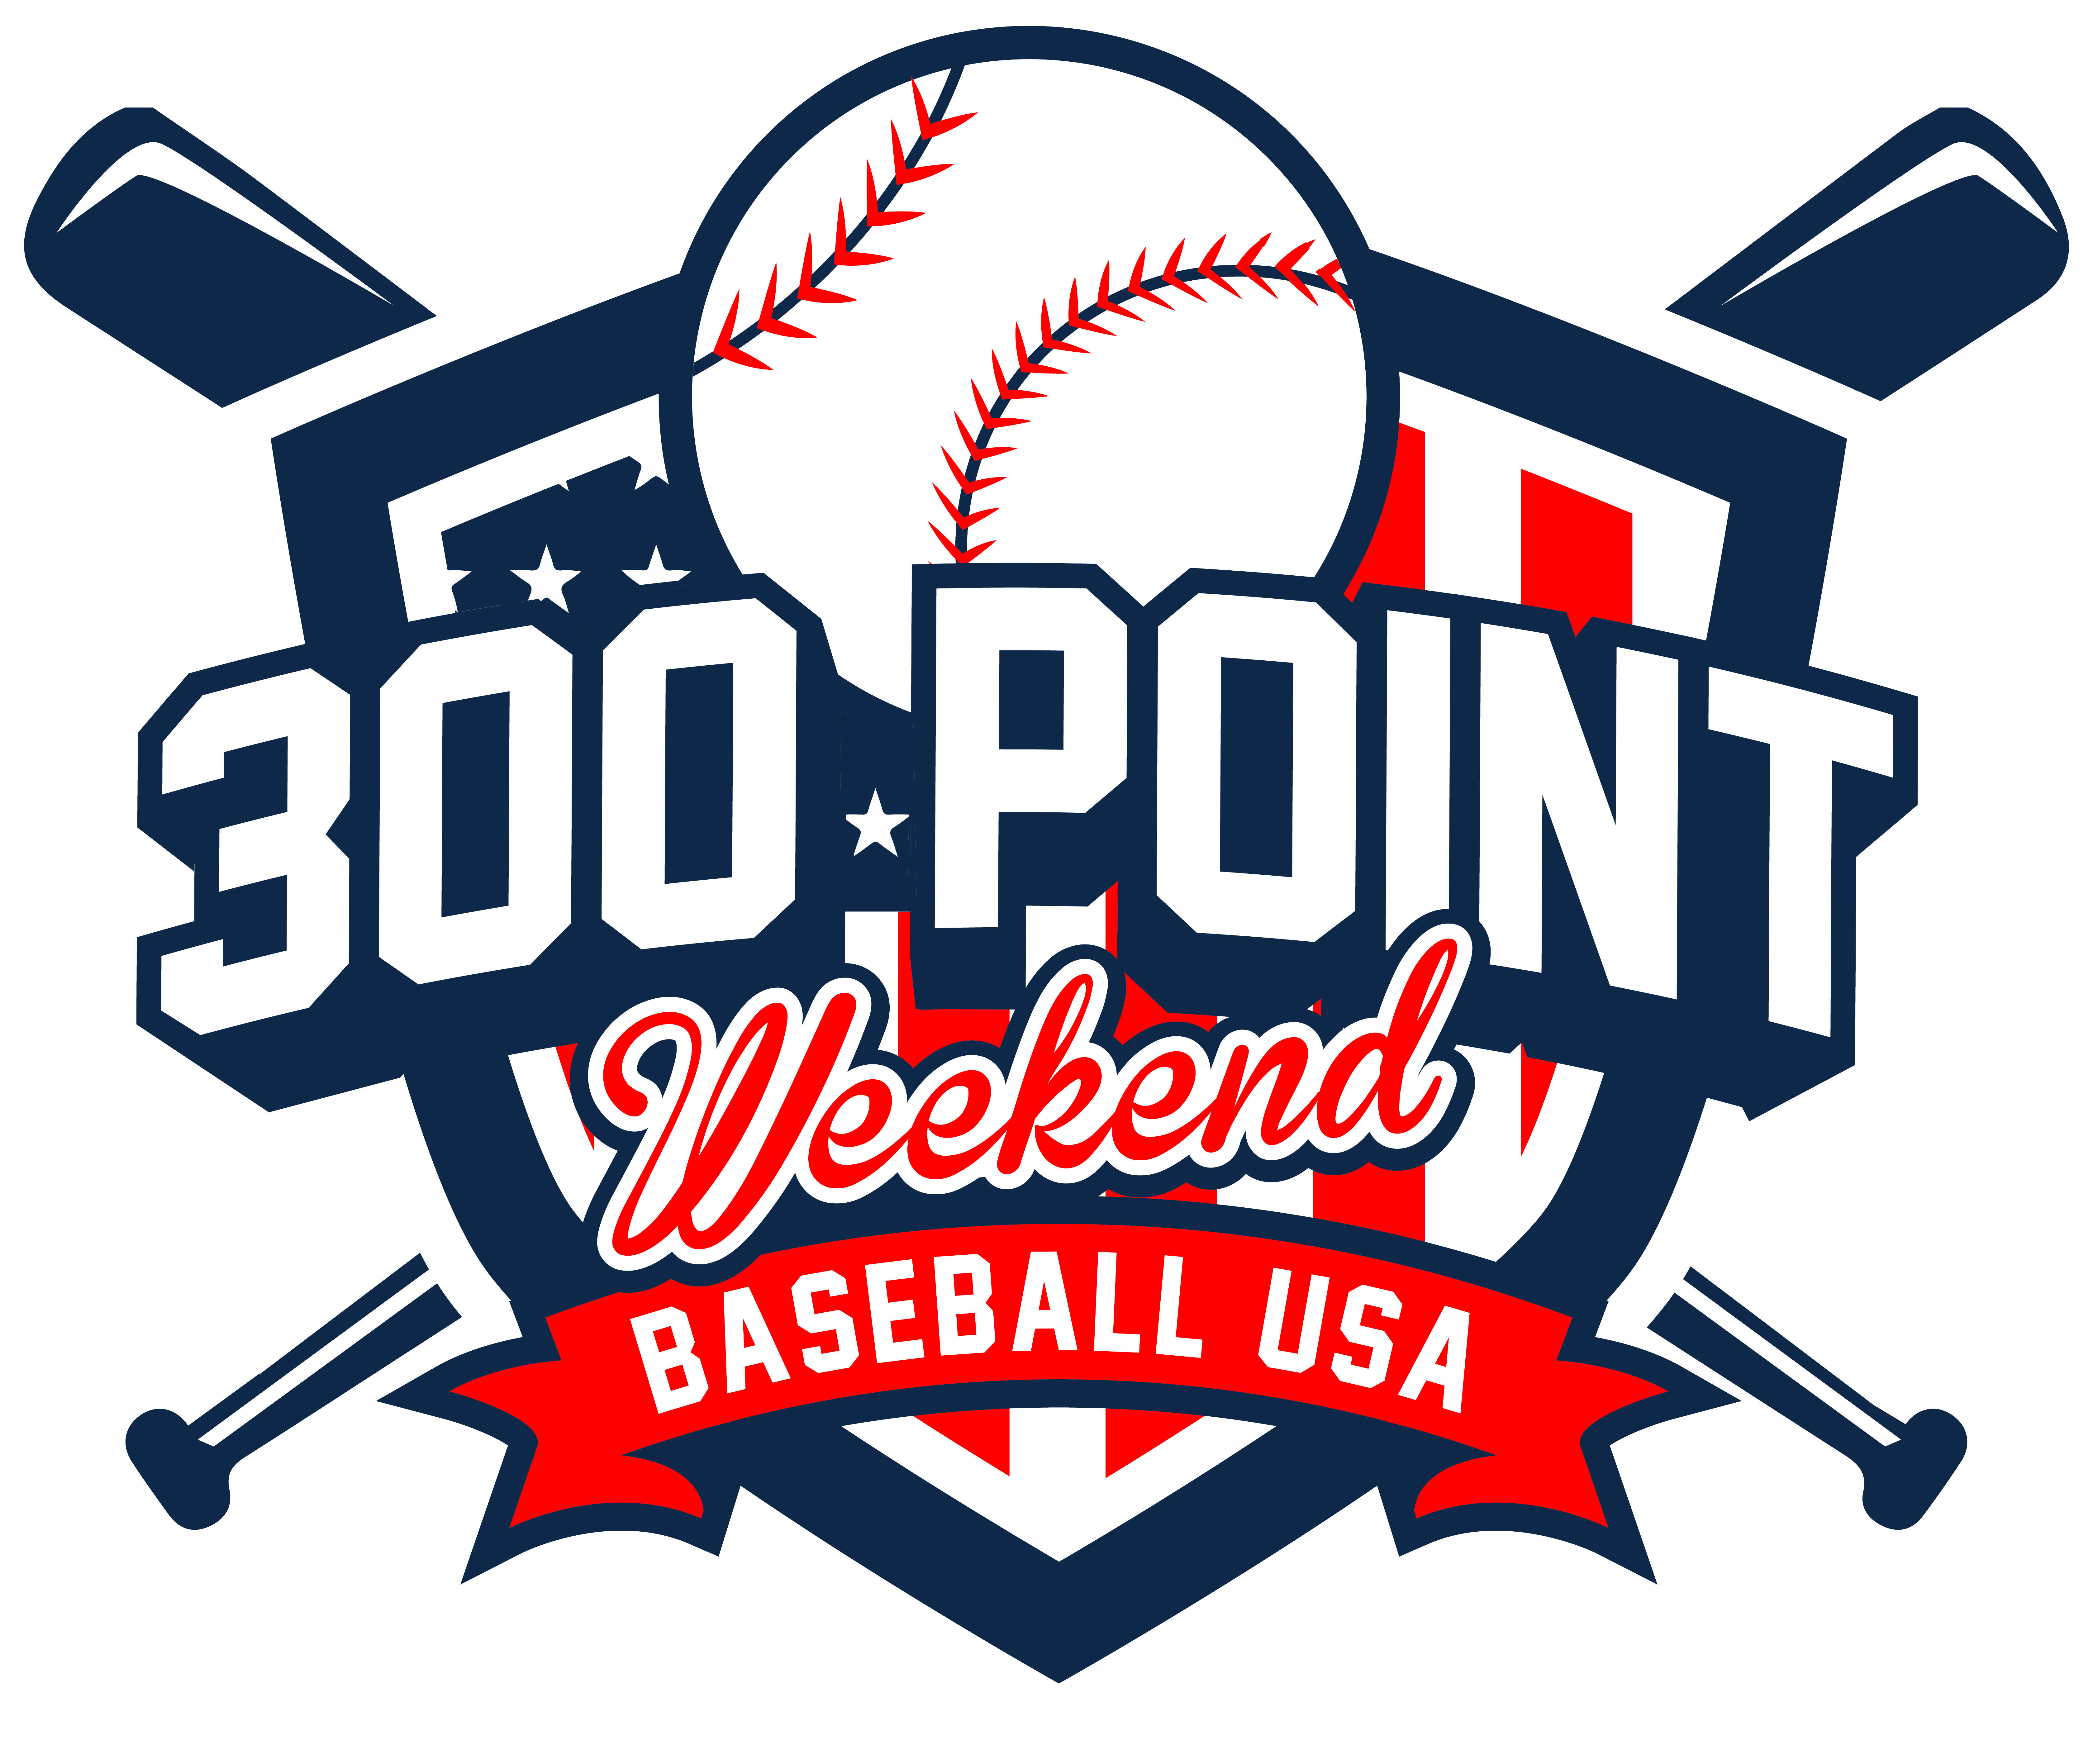 300 Point Tournament